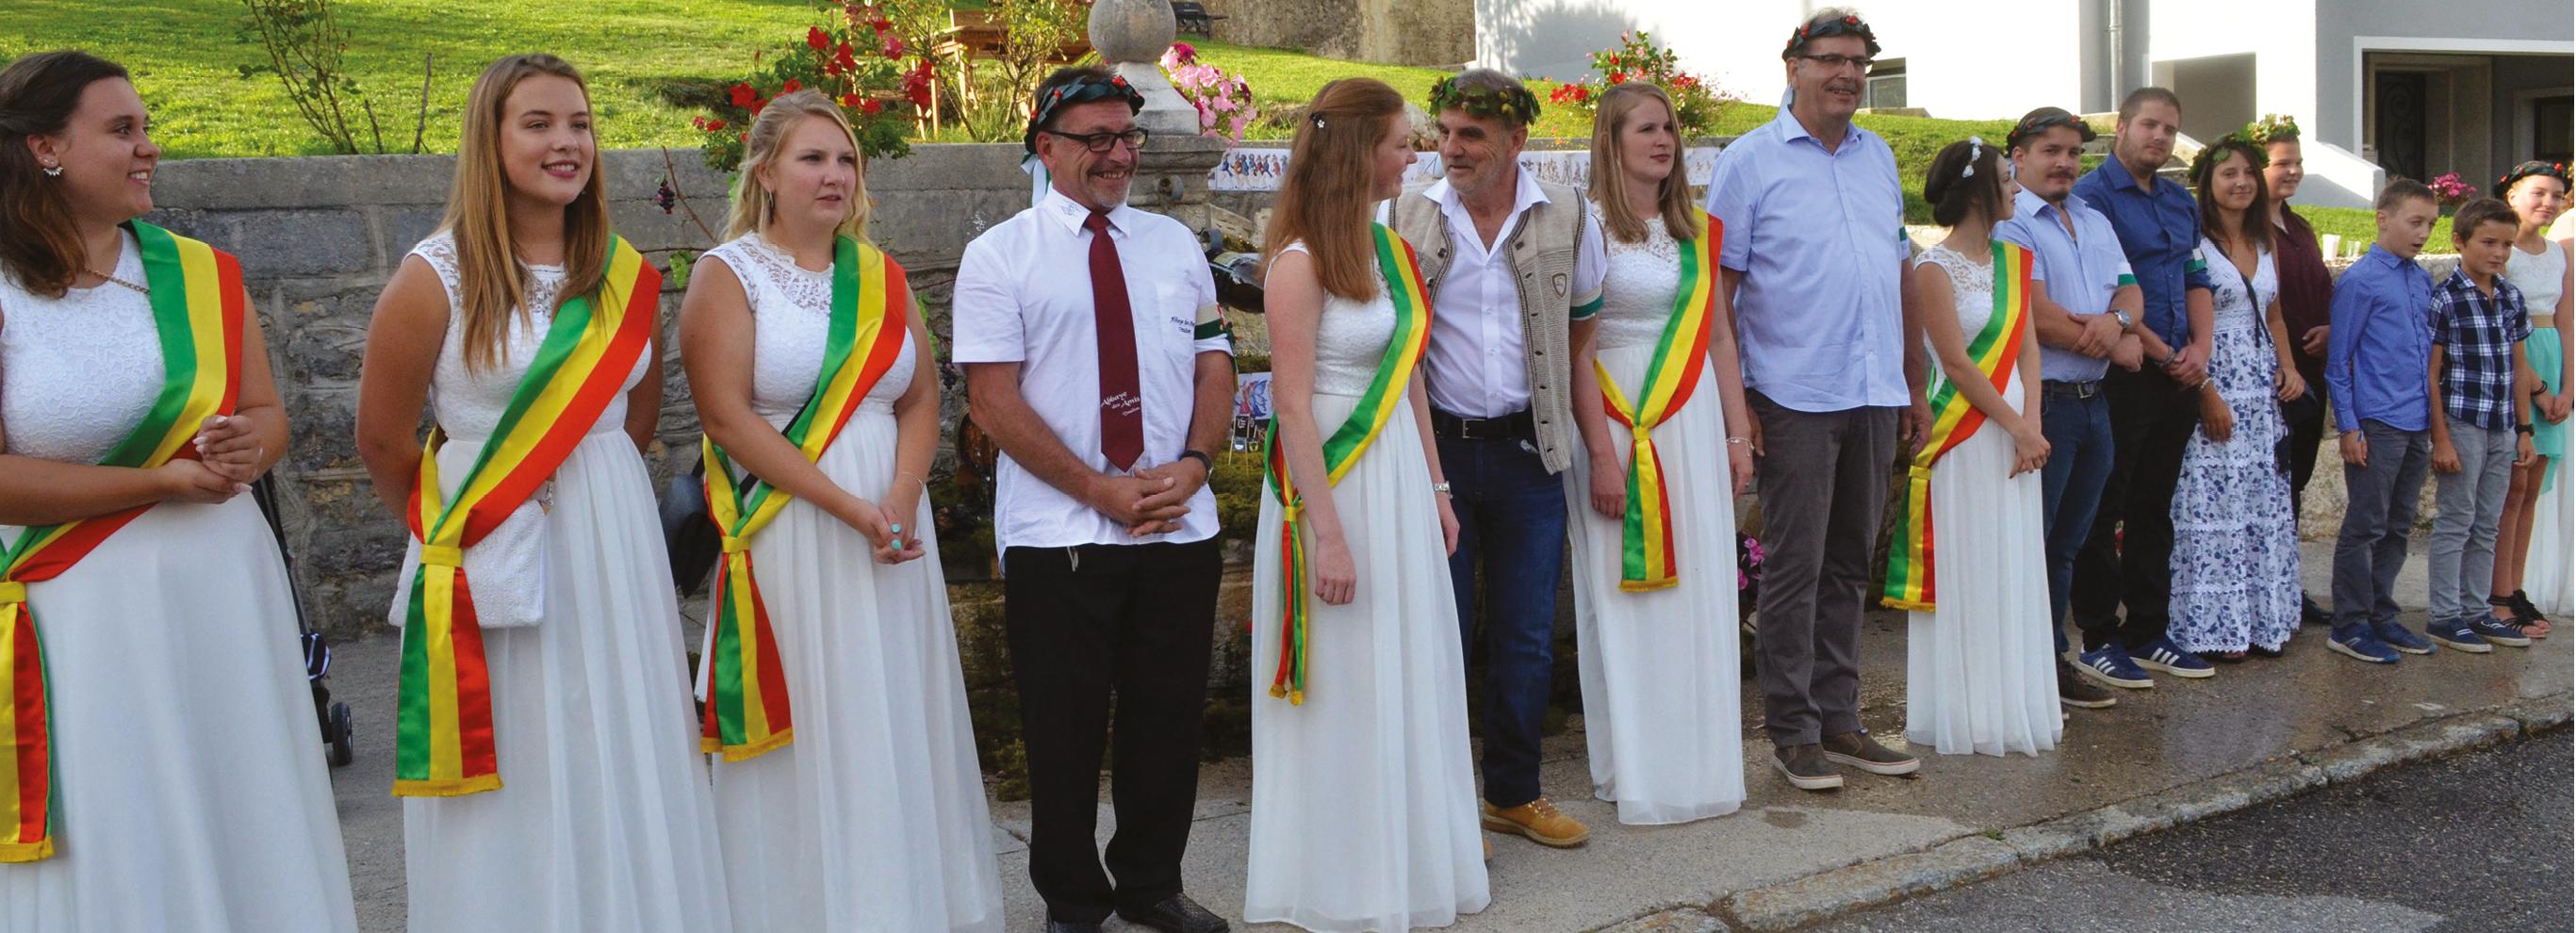 Abbaye des Amis : Quand les traditions demeurent